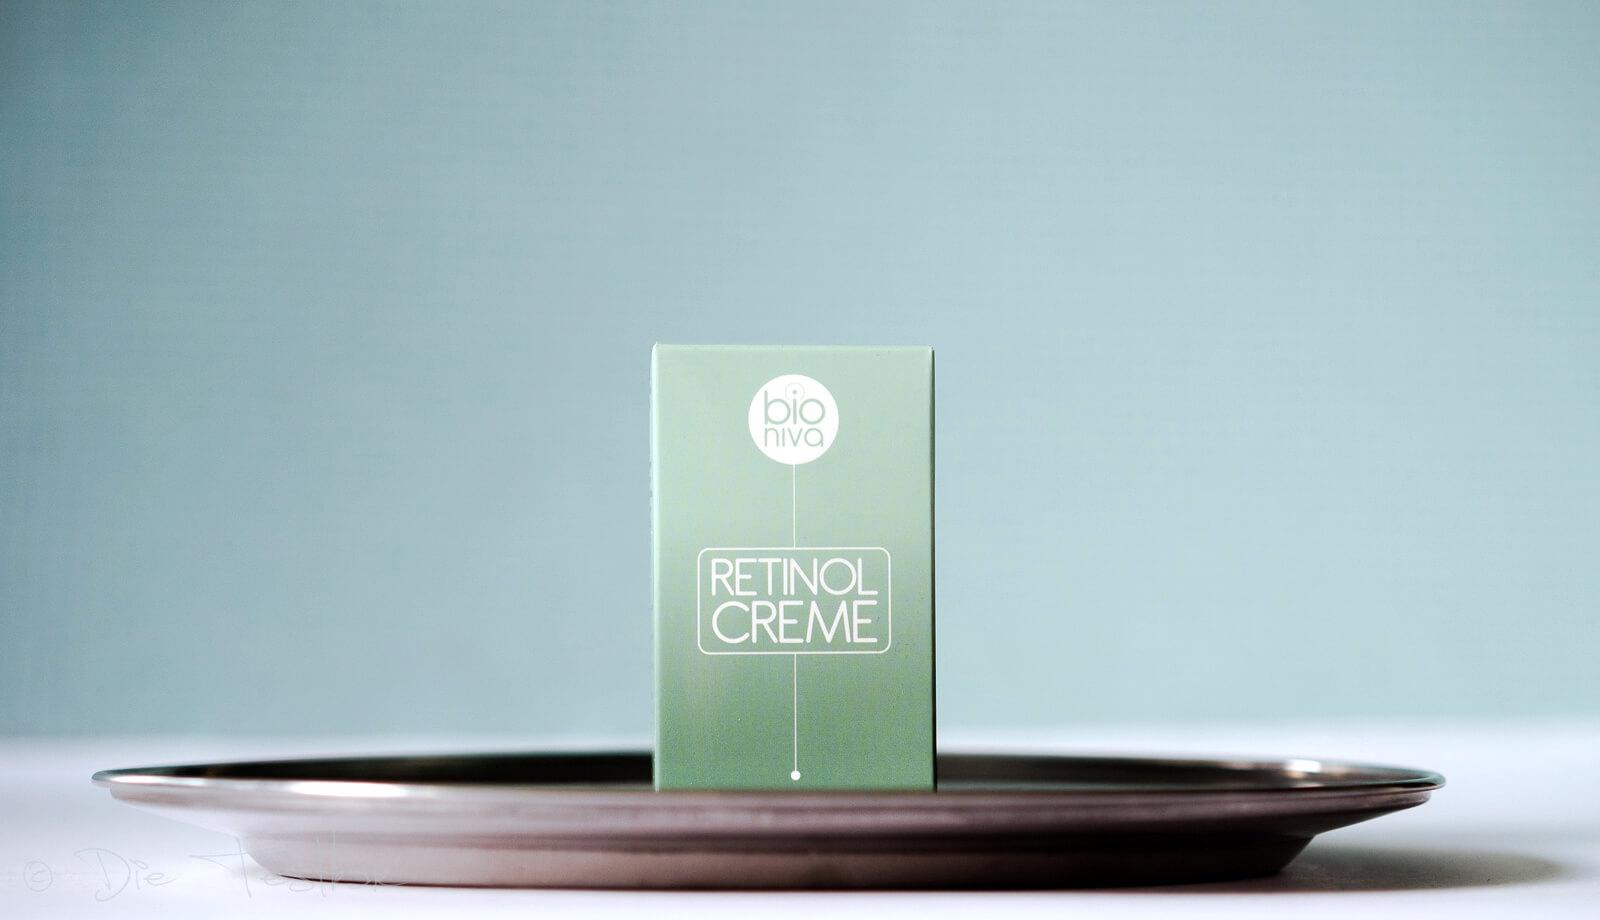 Retinol Creme von Bioniva